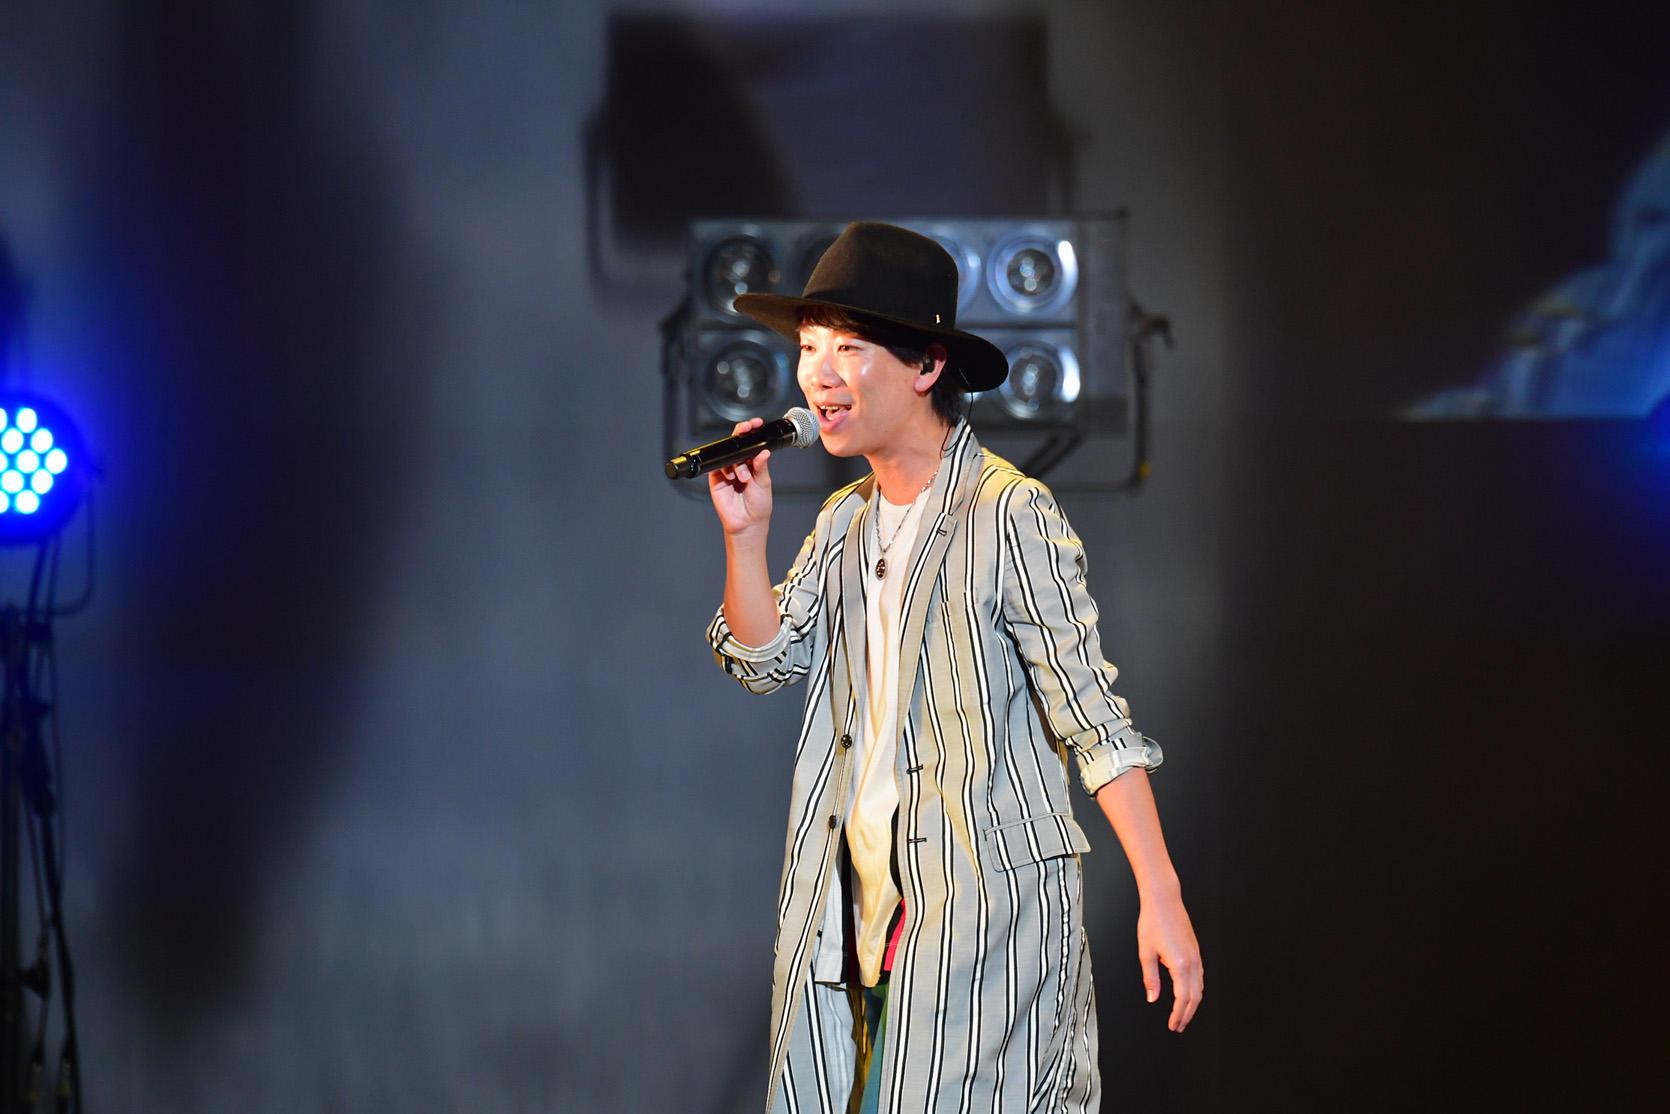 http://news.yoshimoto.co.jp/20181201025339-c65563ac2197ae3177d9dee0d50a511b869c385a.jpg